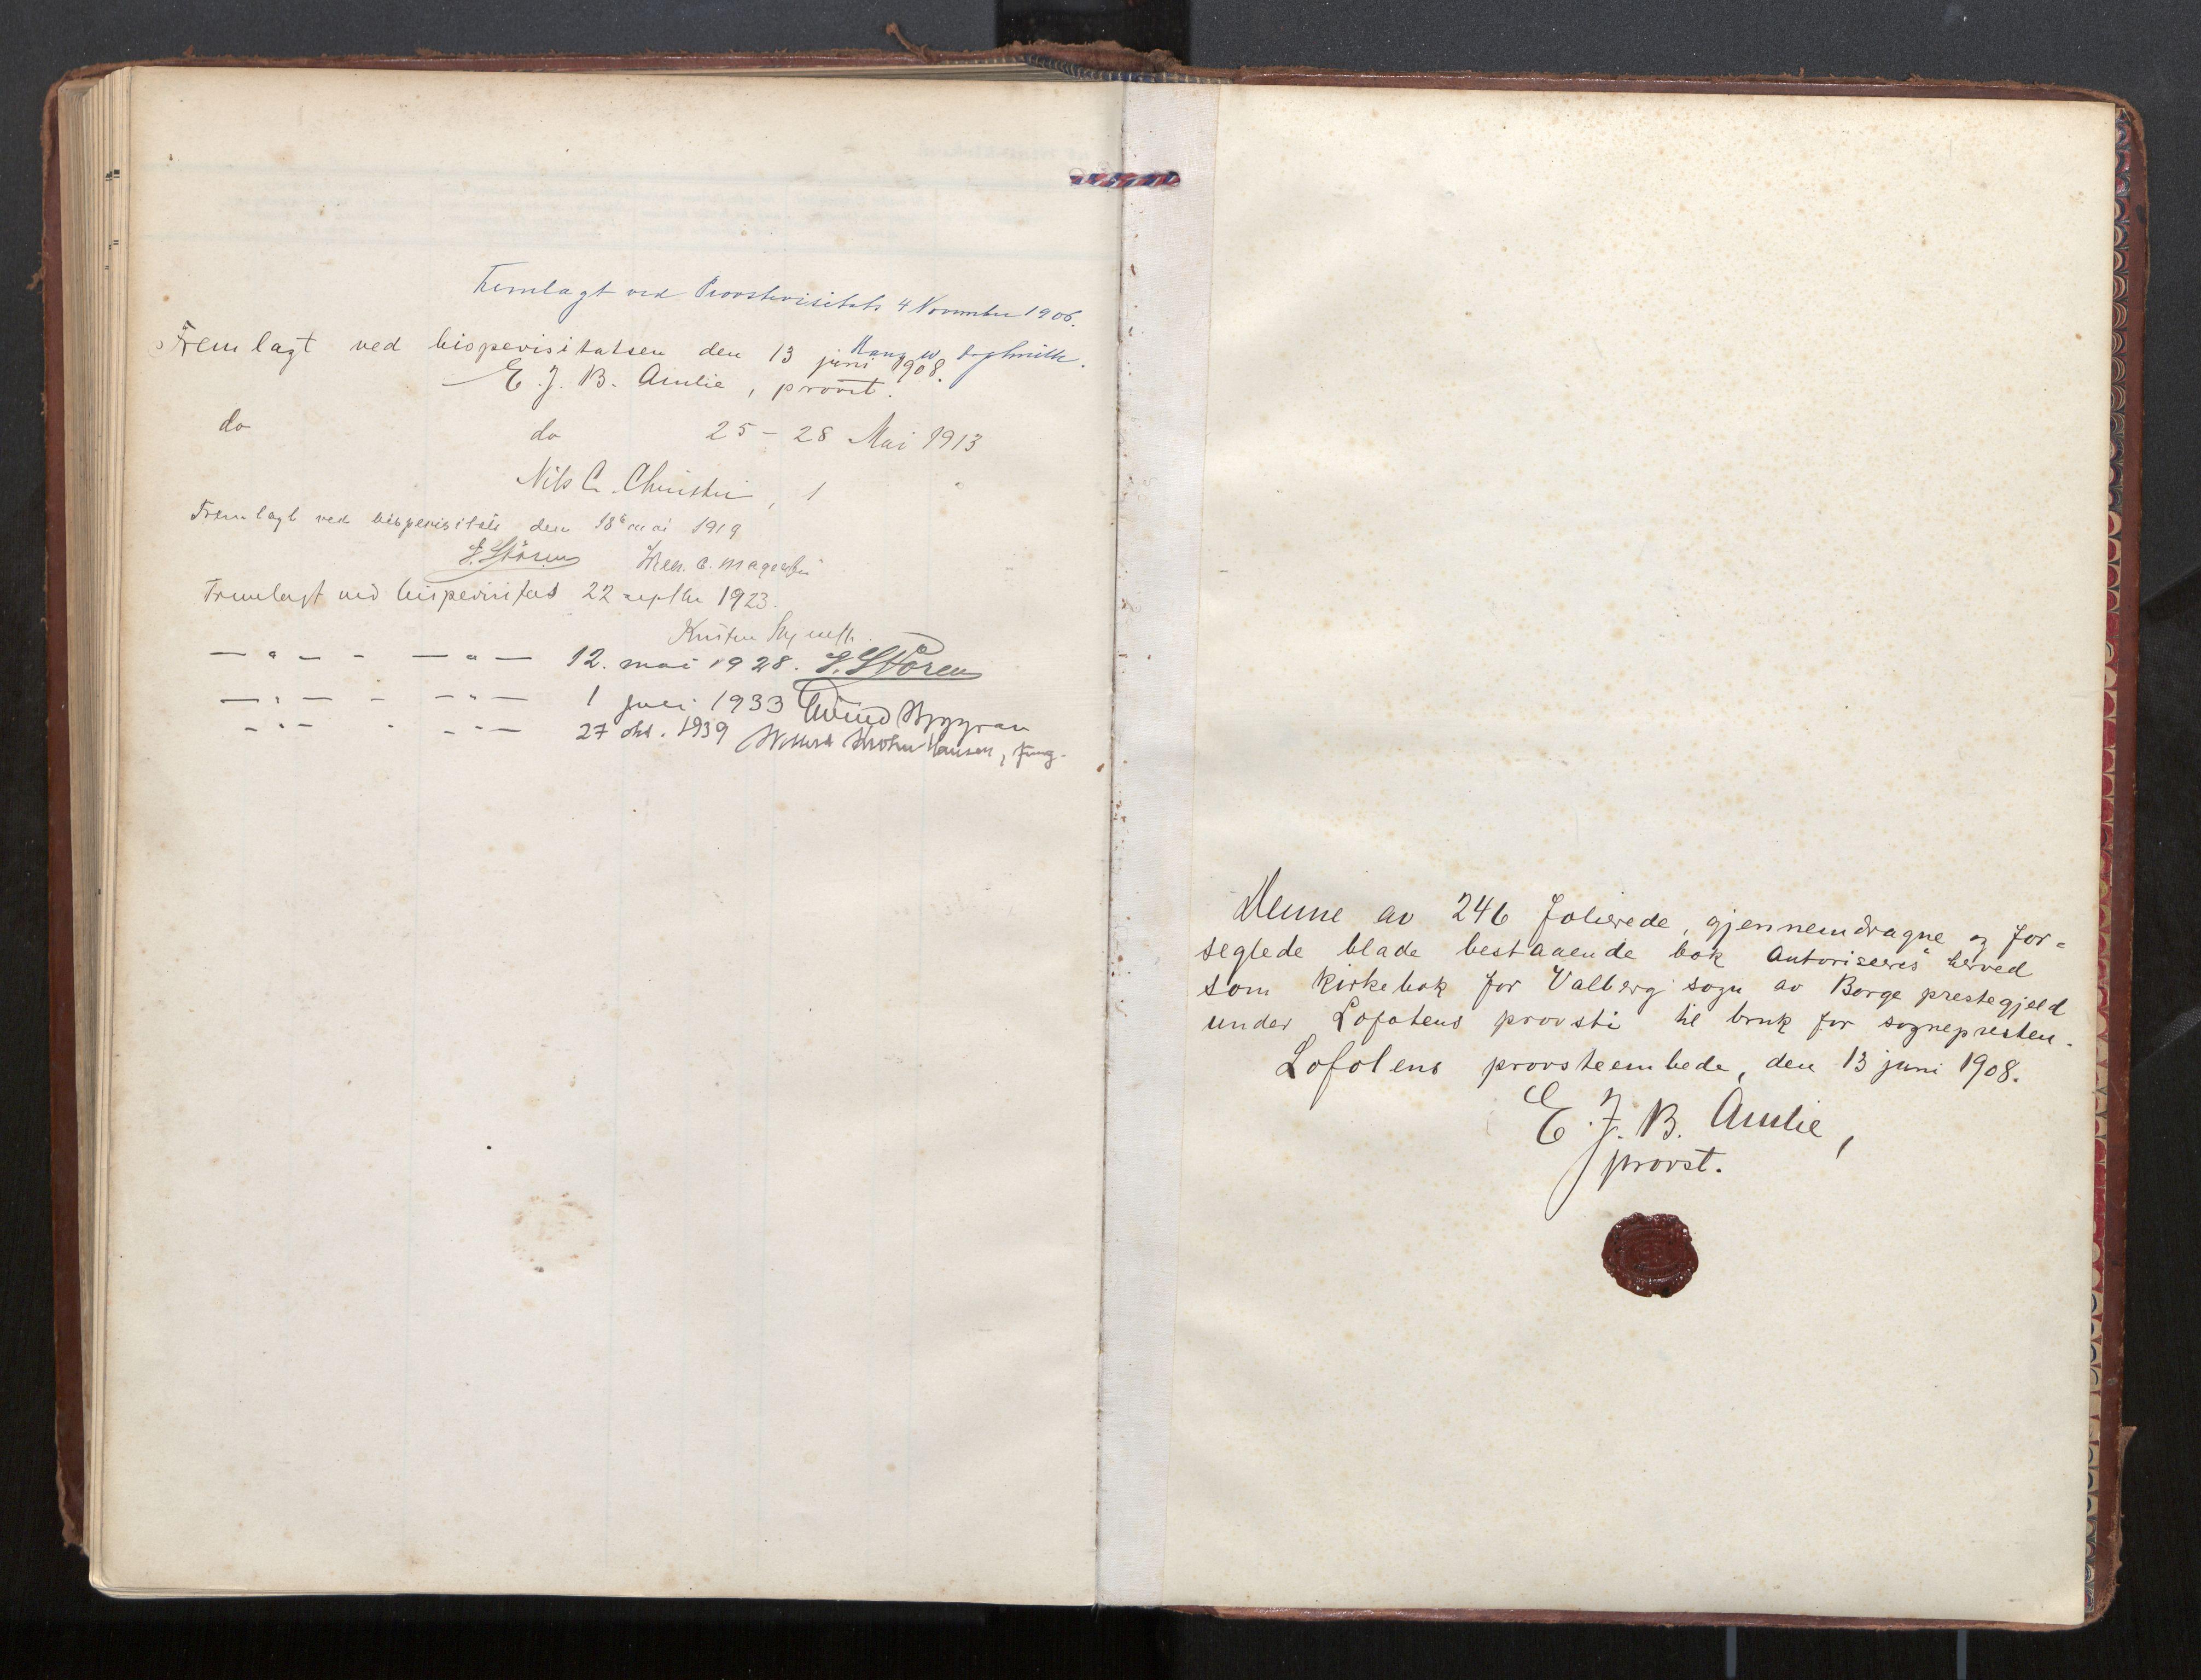 SAT, Ministerialprotokoller, klokkerbøker og fødselsregistre - Nordland, 884/L1194: Ministerialbok nr. 884A02, 1906-1937